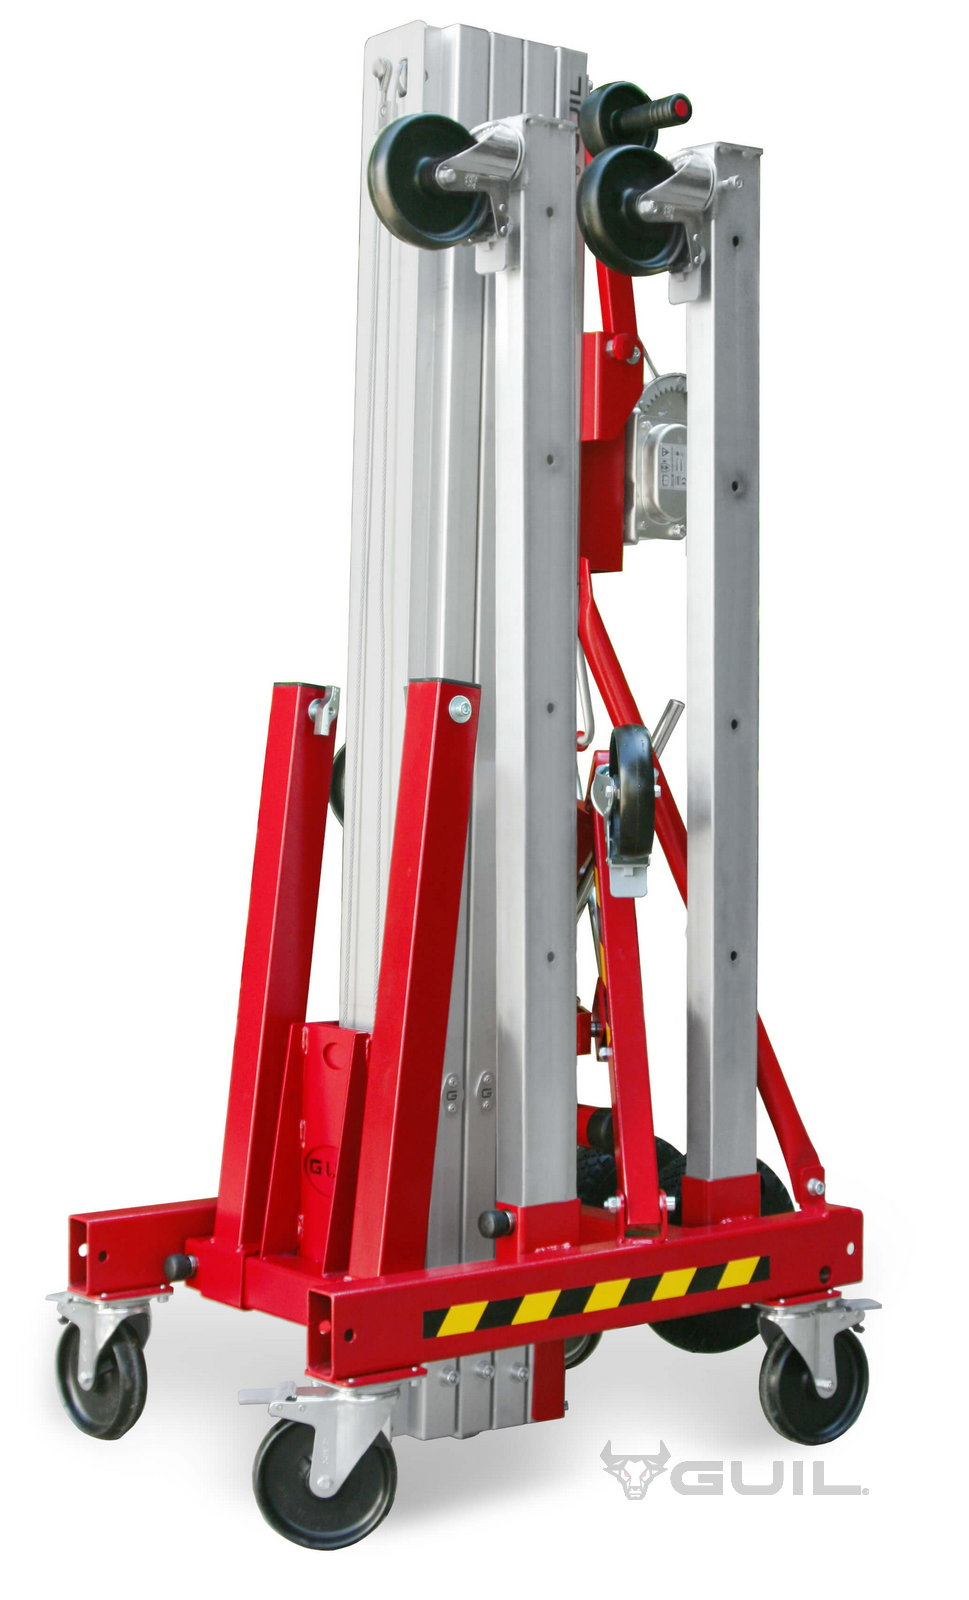 Kanaallift 5,15 m 230 kg compact (2)